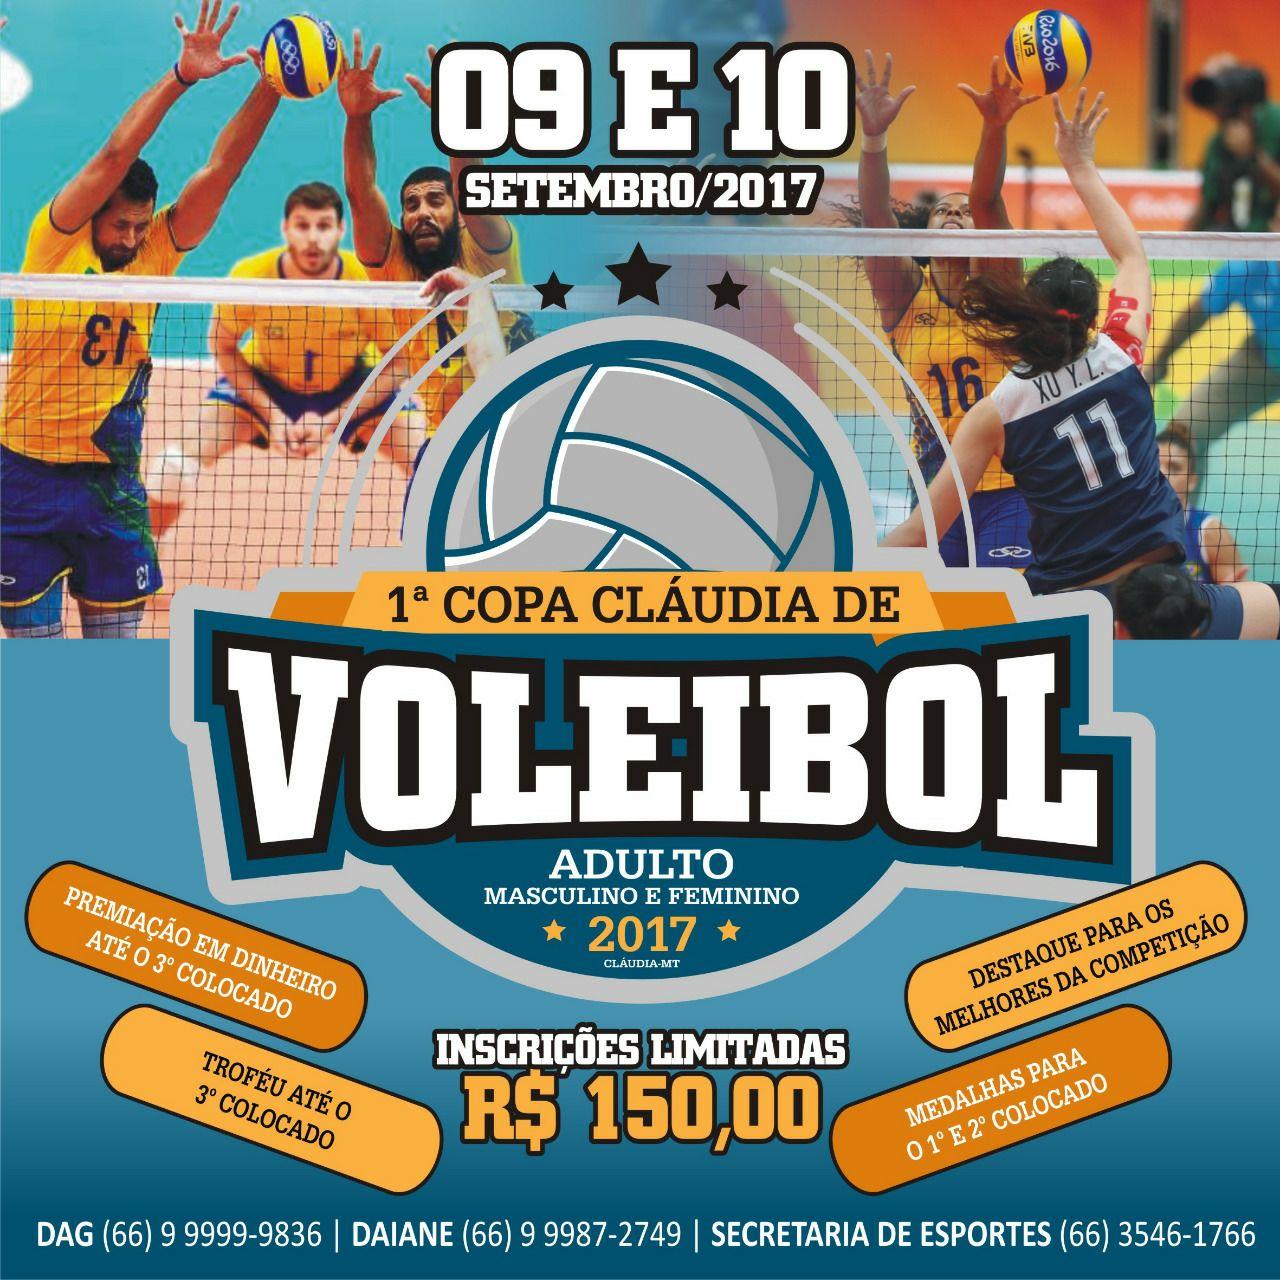 1ª copa Cláudia de voleibol adulto masculino e feminino começa ... 3c4a52bf98d9c